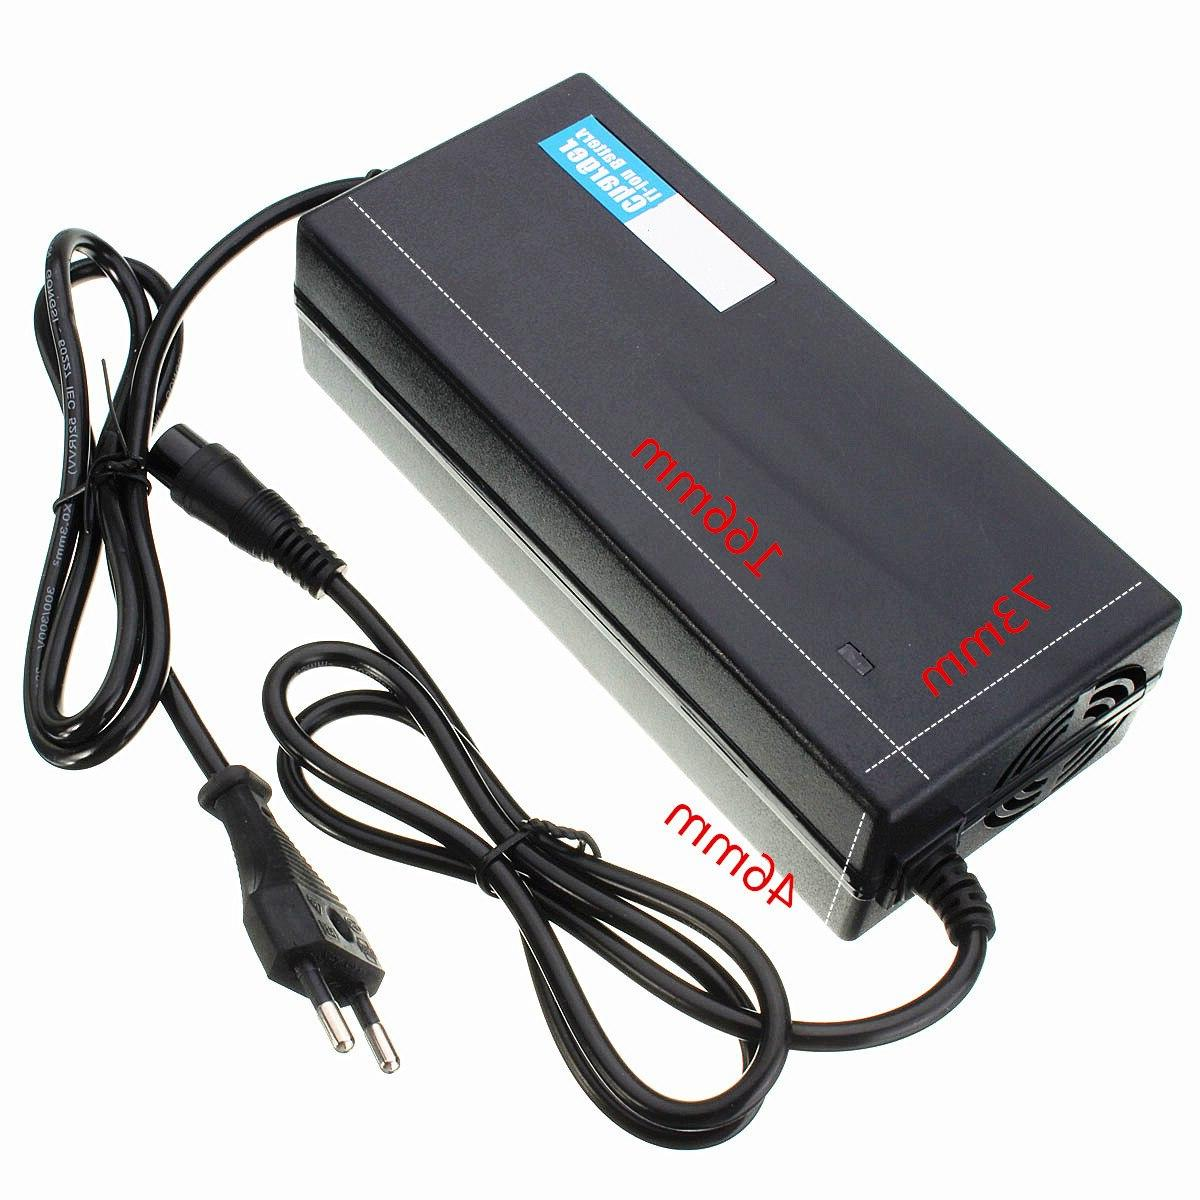 CLAITE 67.2V2A 67.2V 2A Li-ion <font><b>Electric</b></font> Self <font><b>Scooter</b></font> Smart Lithium <font><b>Battery</b></font> Power